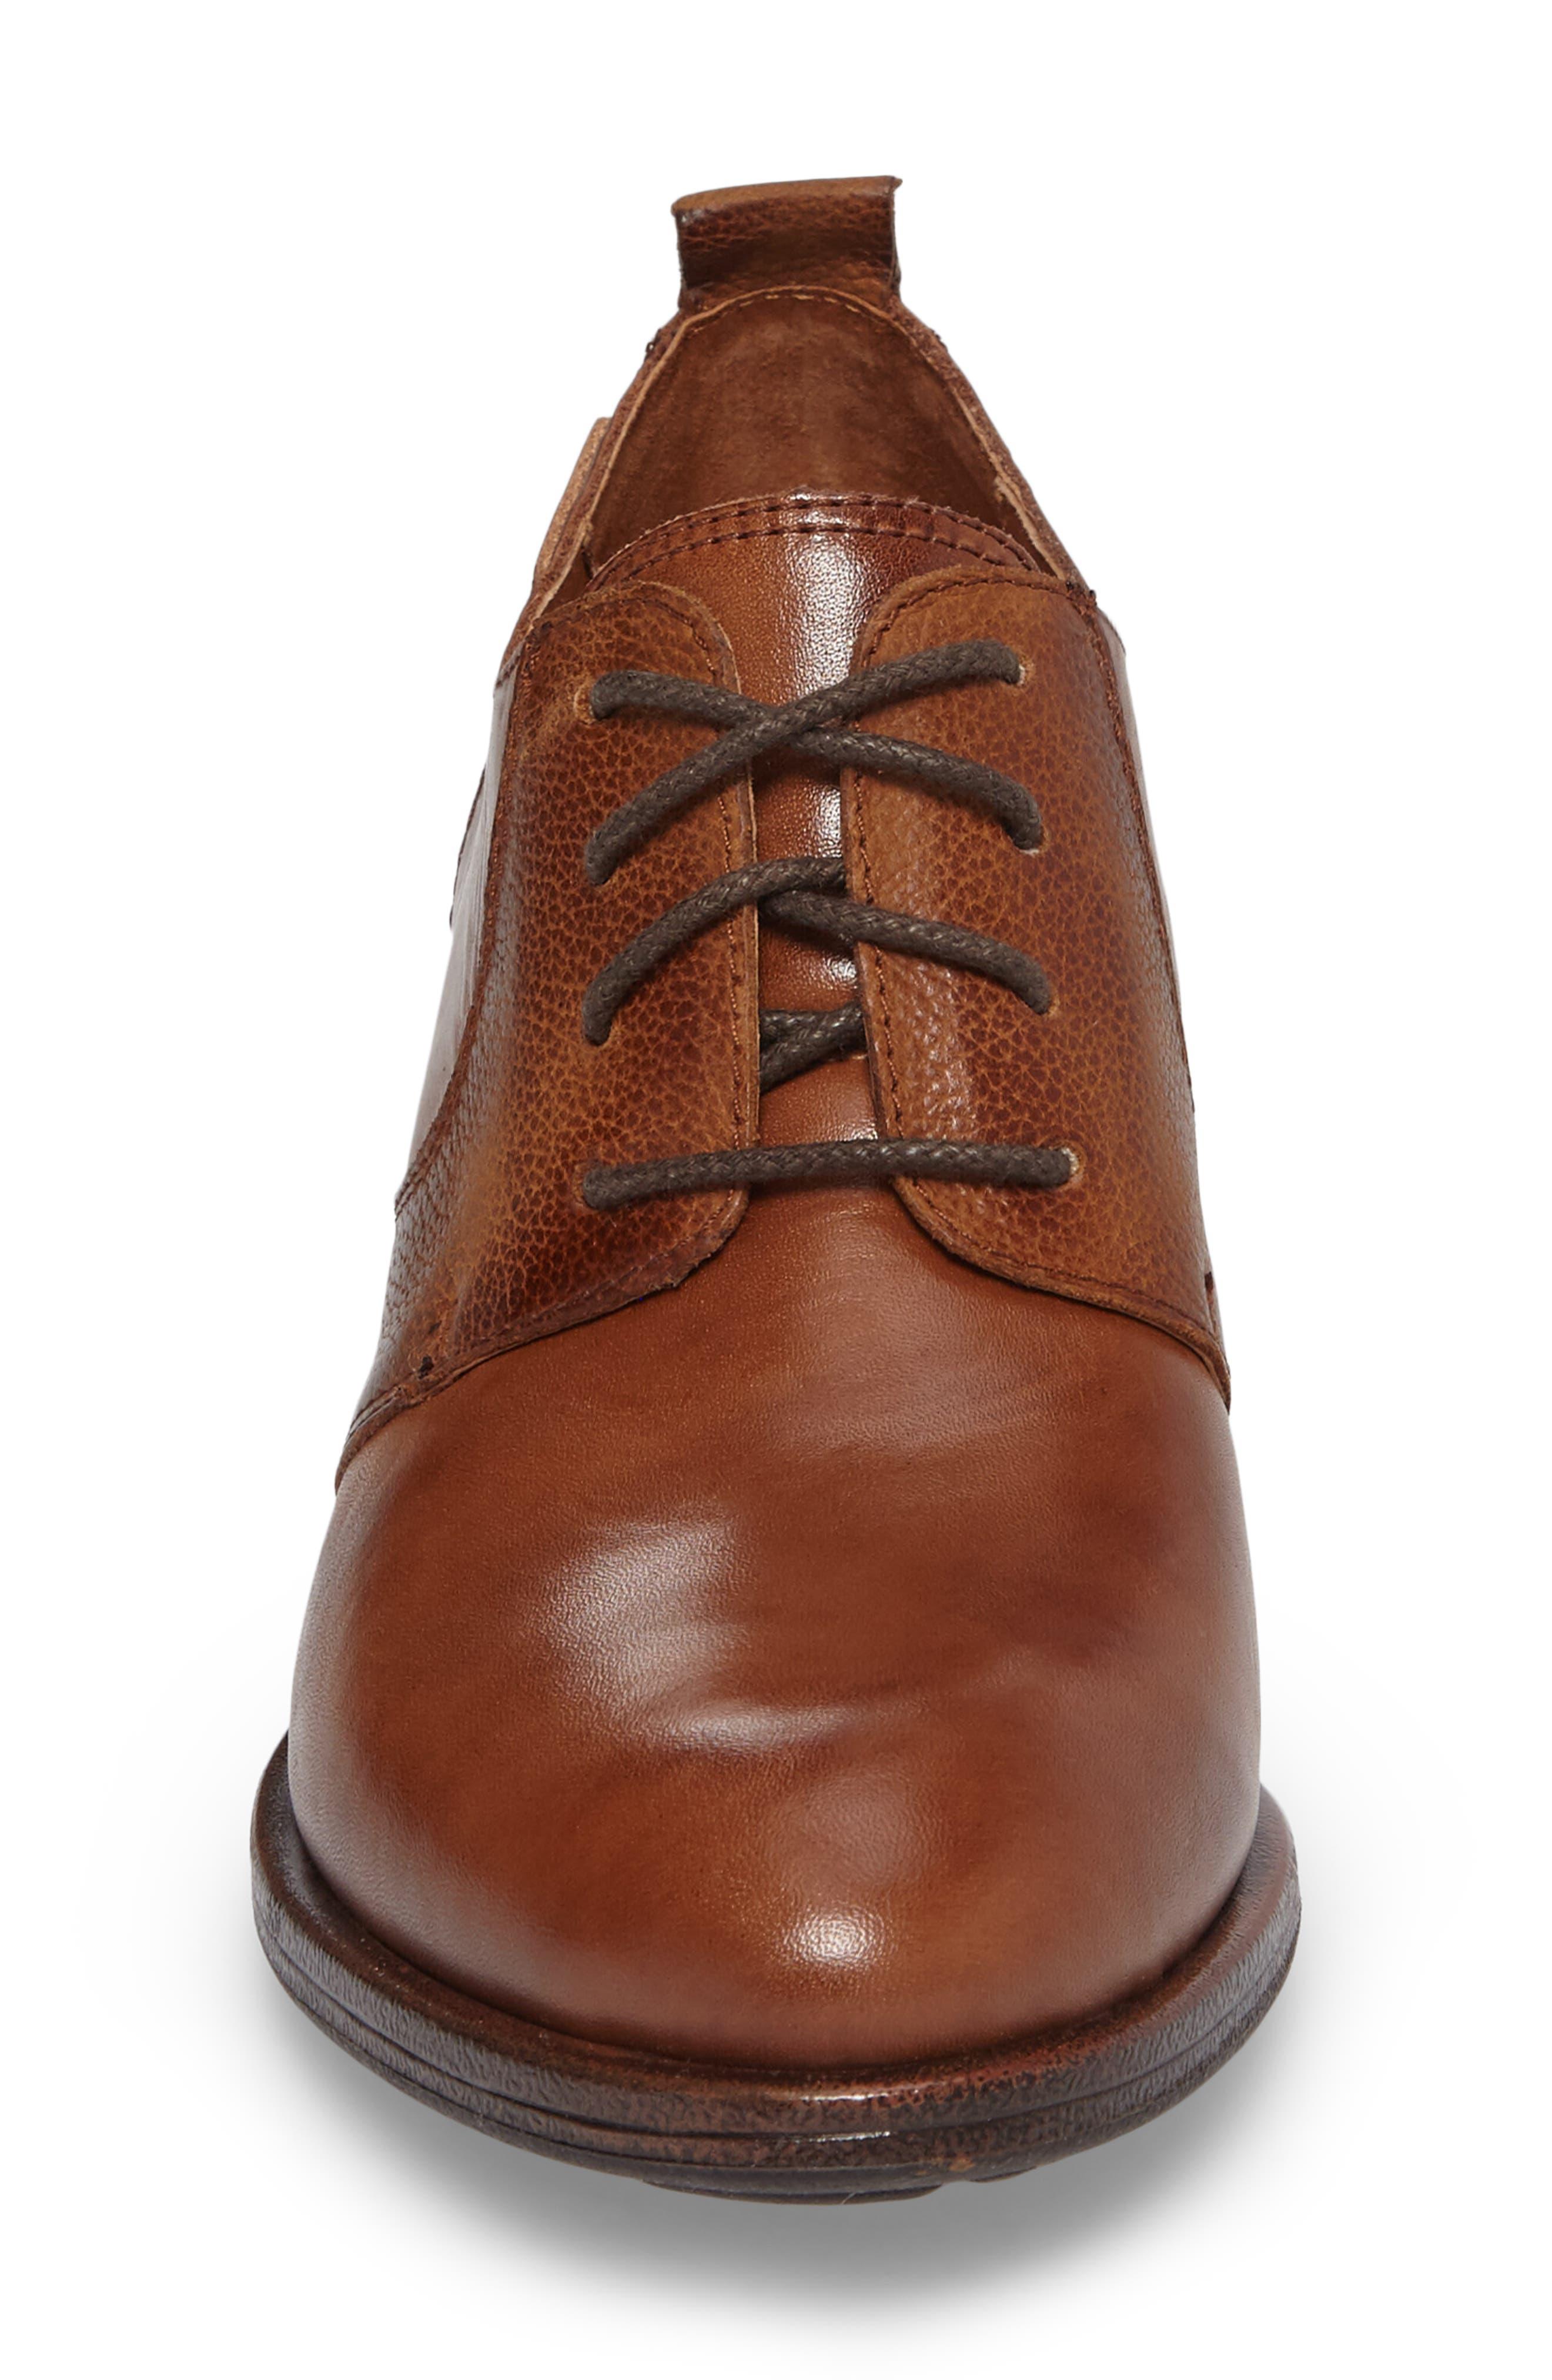 Baqueira Oxford Pump,                             Alternate thumbnail 4, color,                             Cuero Brandy Leather